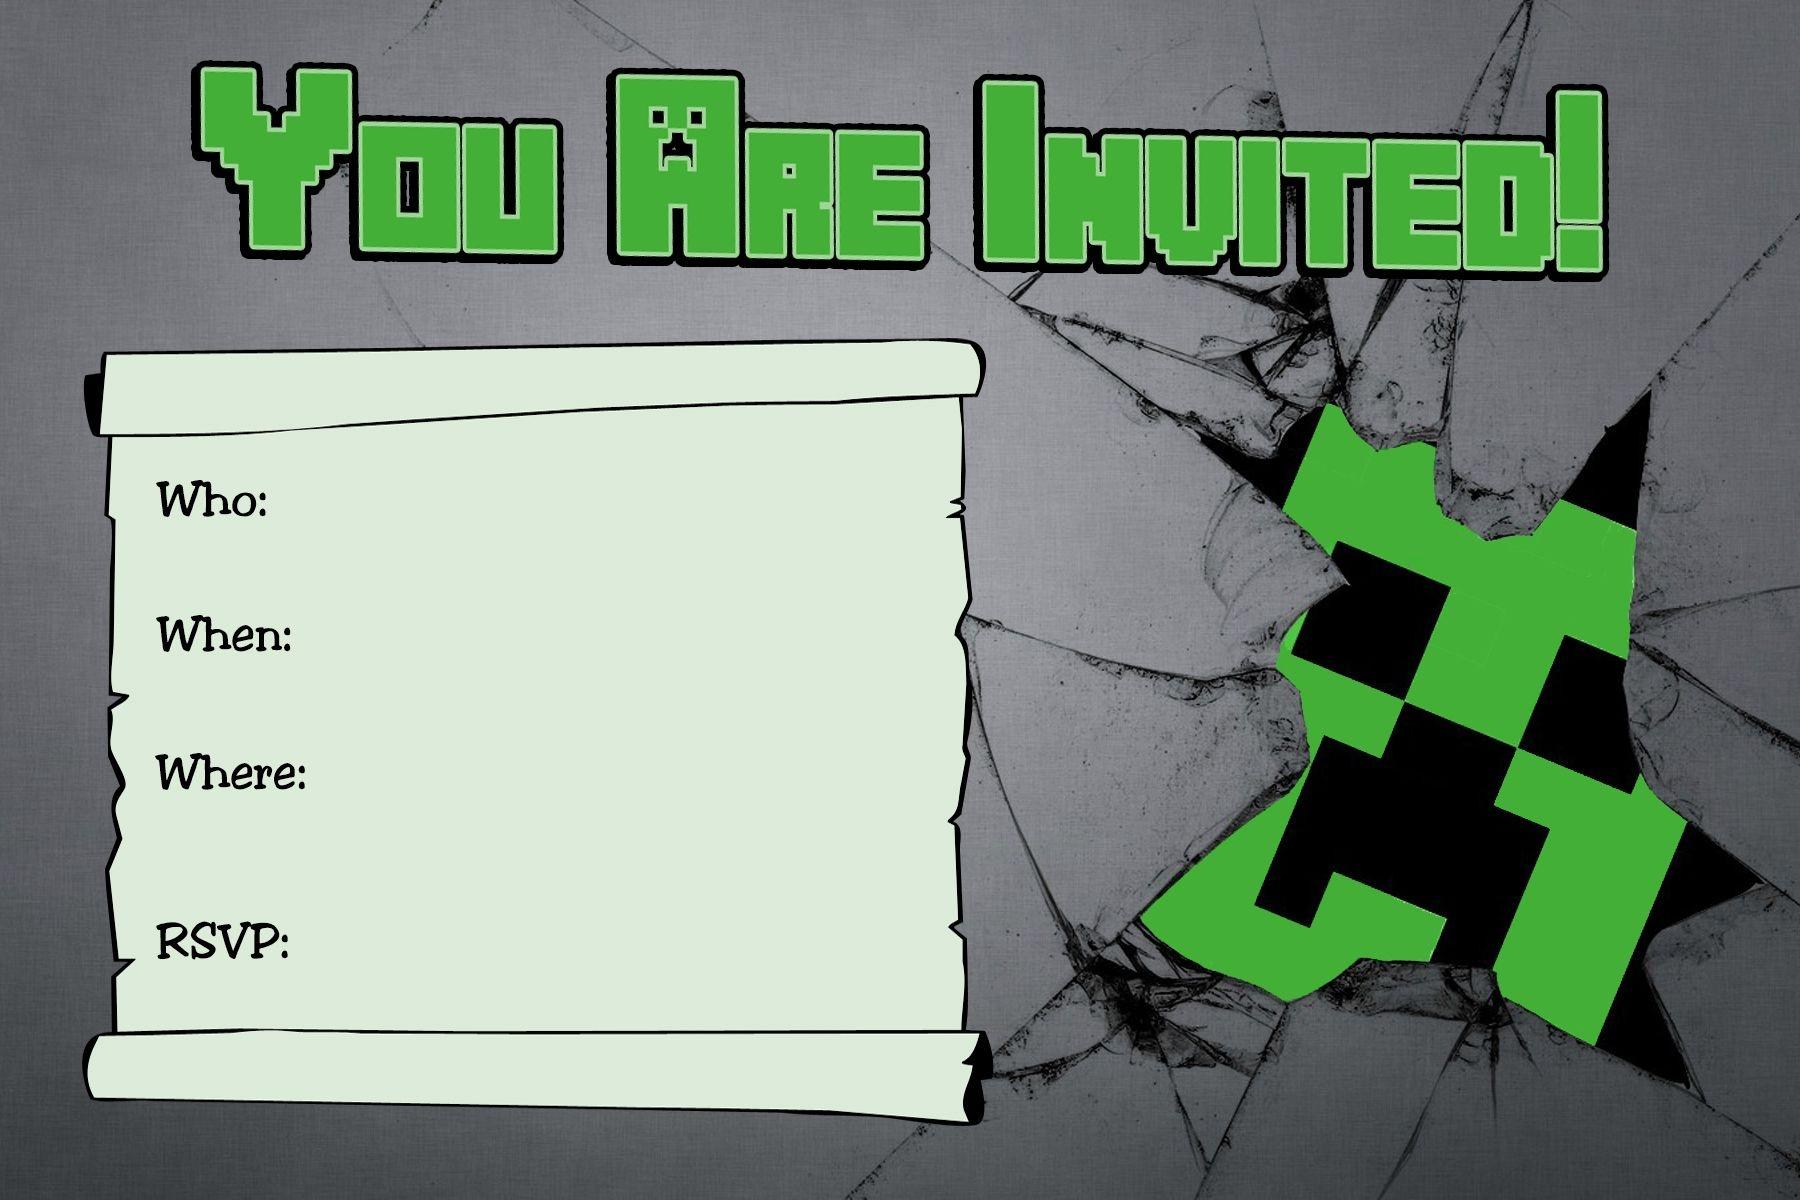 Free Minecraft Creeper Inspired Birthday Invitation Printable - Free Printable Minecraft Birthday Party Invitations Templates